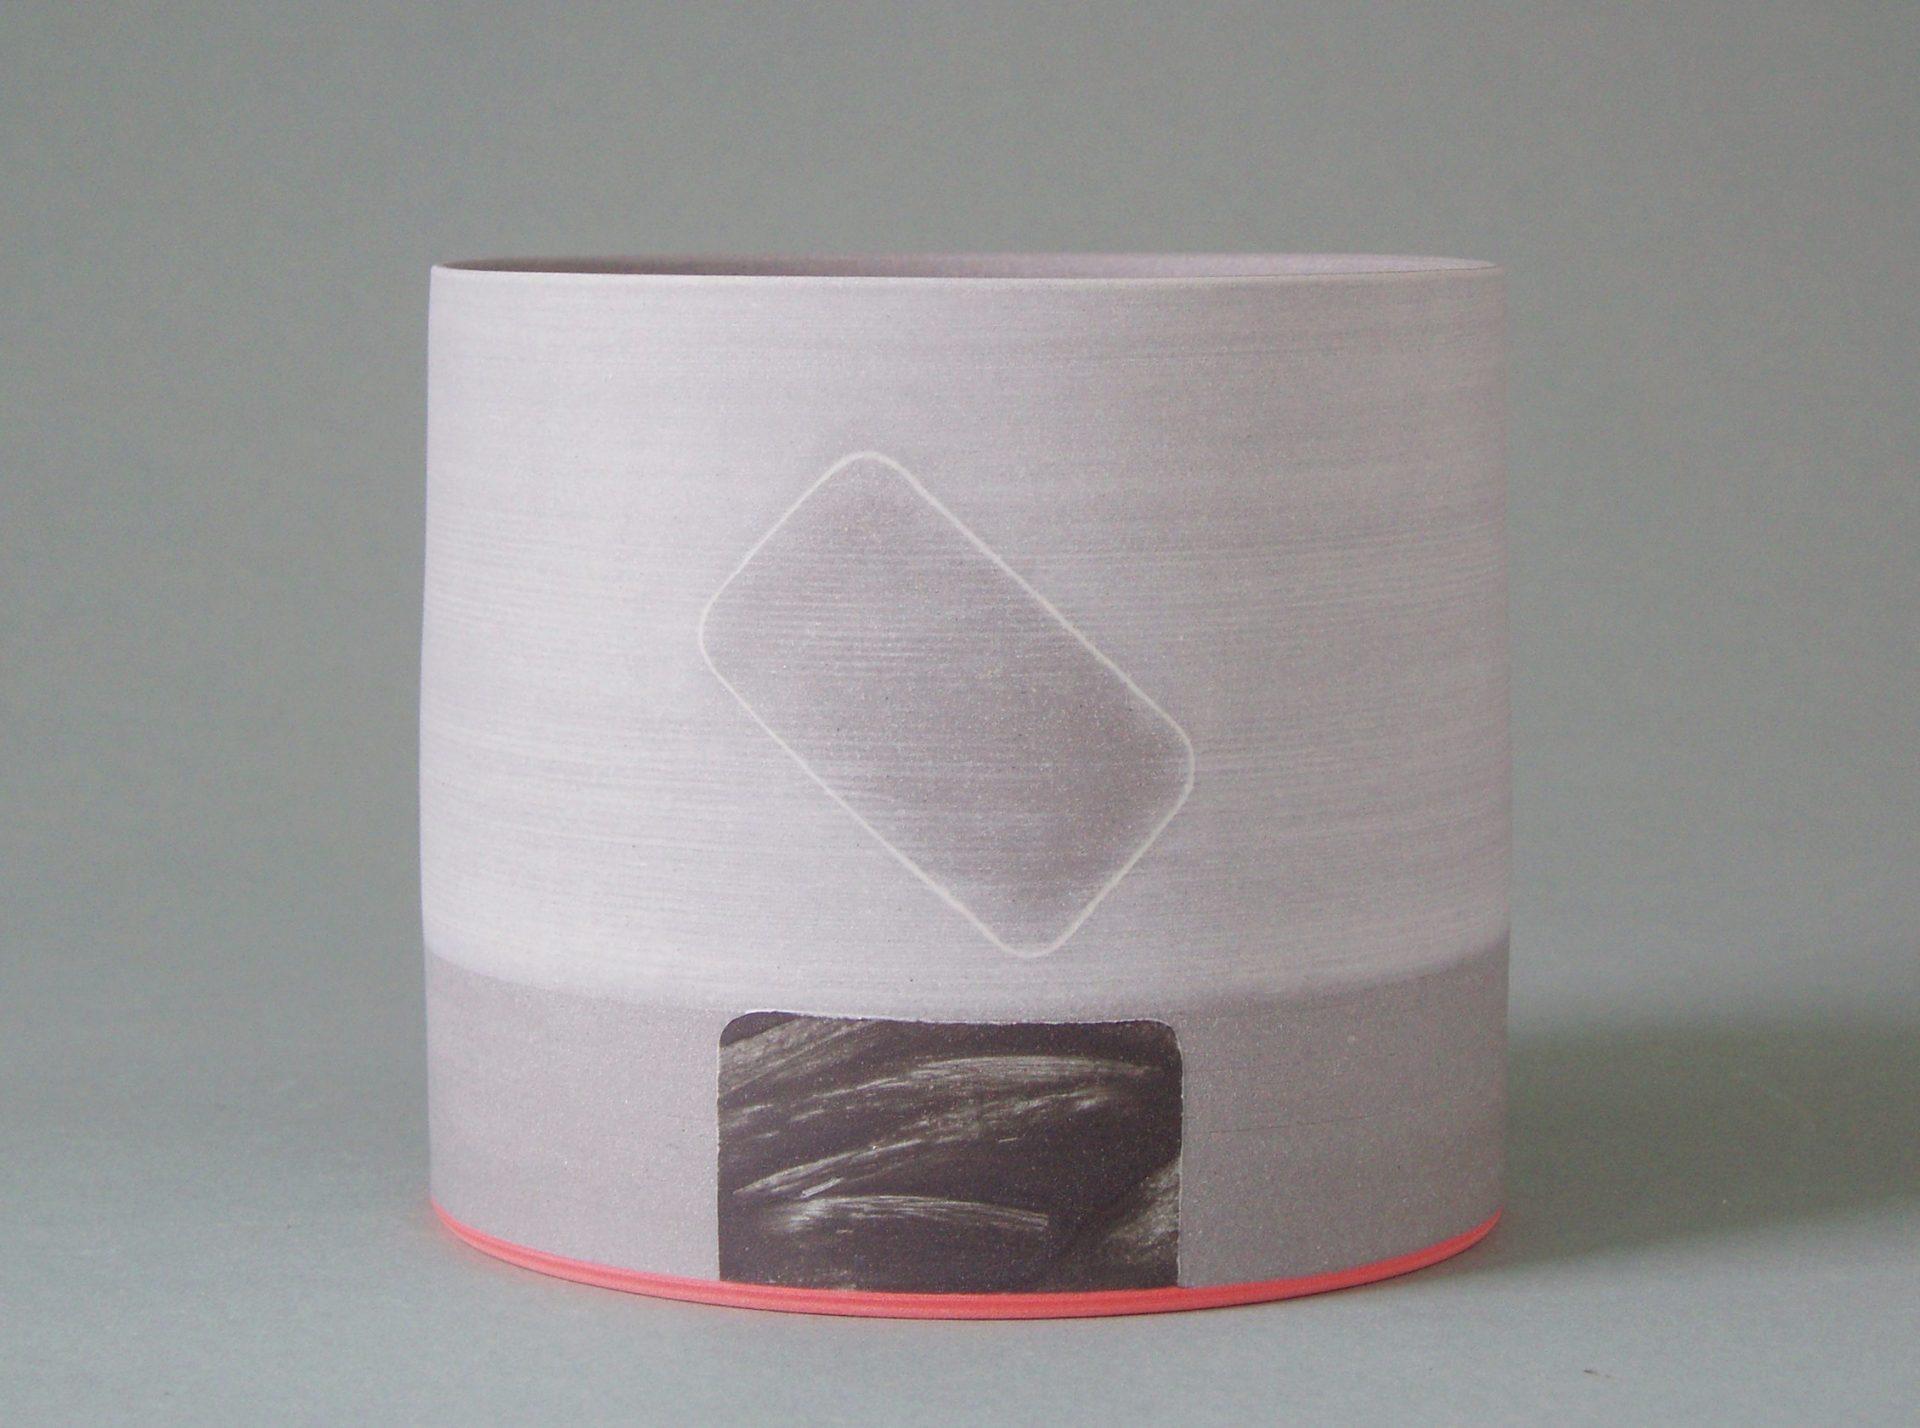 86-plinth-h9cm-may-13-£250